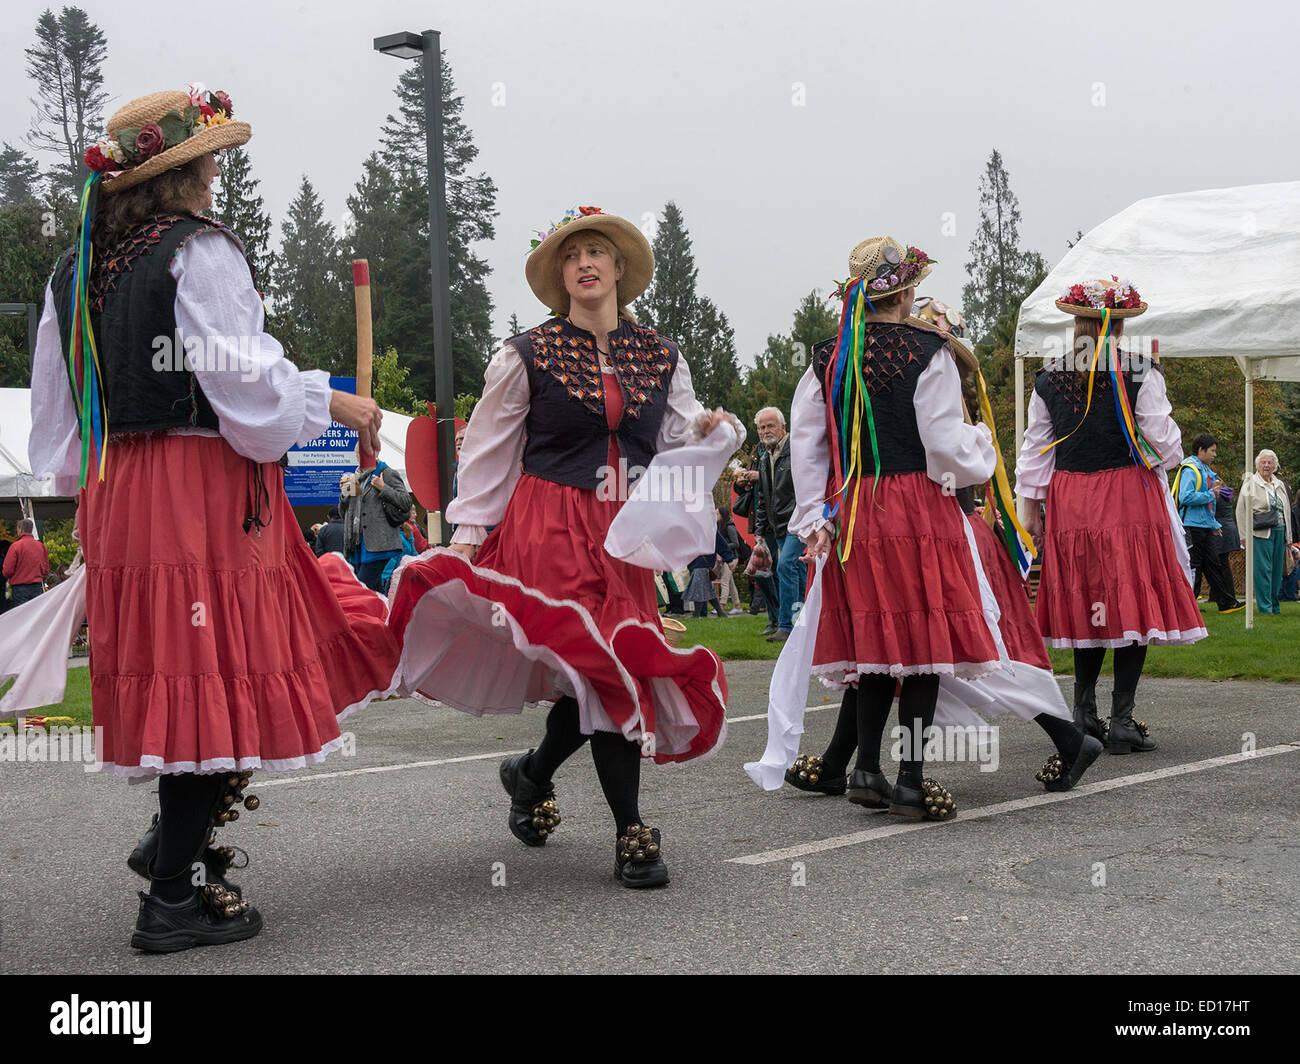 Morris dancers #17, Vancouver, British Columbia, Canada - Stock Image